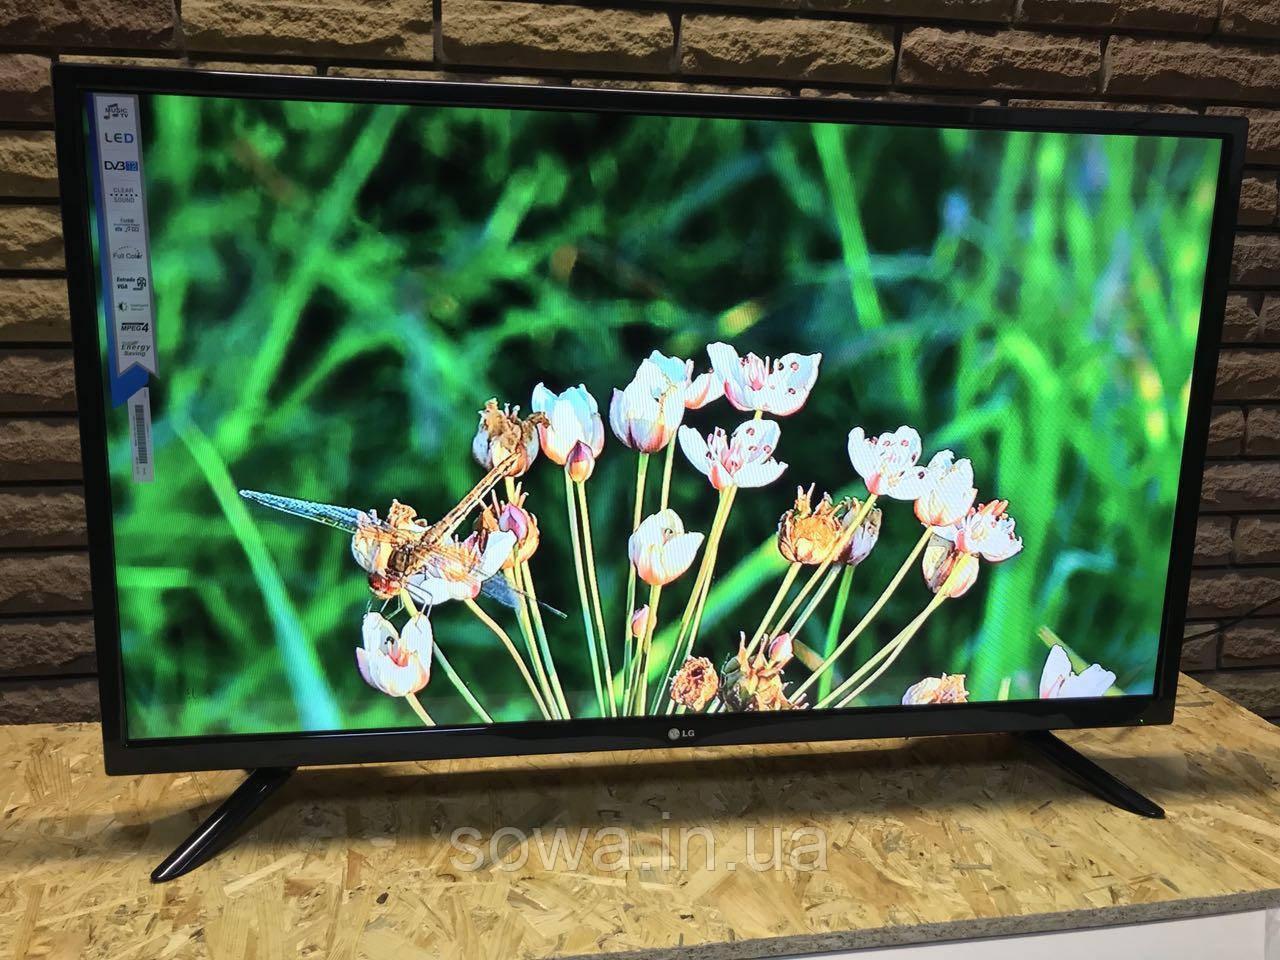 "✔️ ТВ Телевизор LG - диаональ 46"" дюймов с Т2 + Smart Tv"